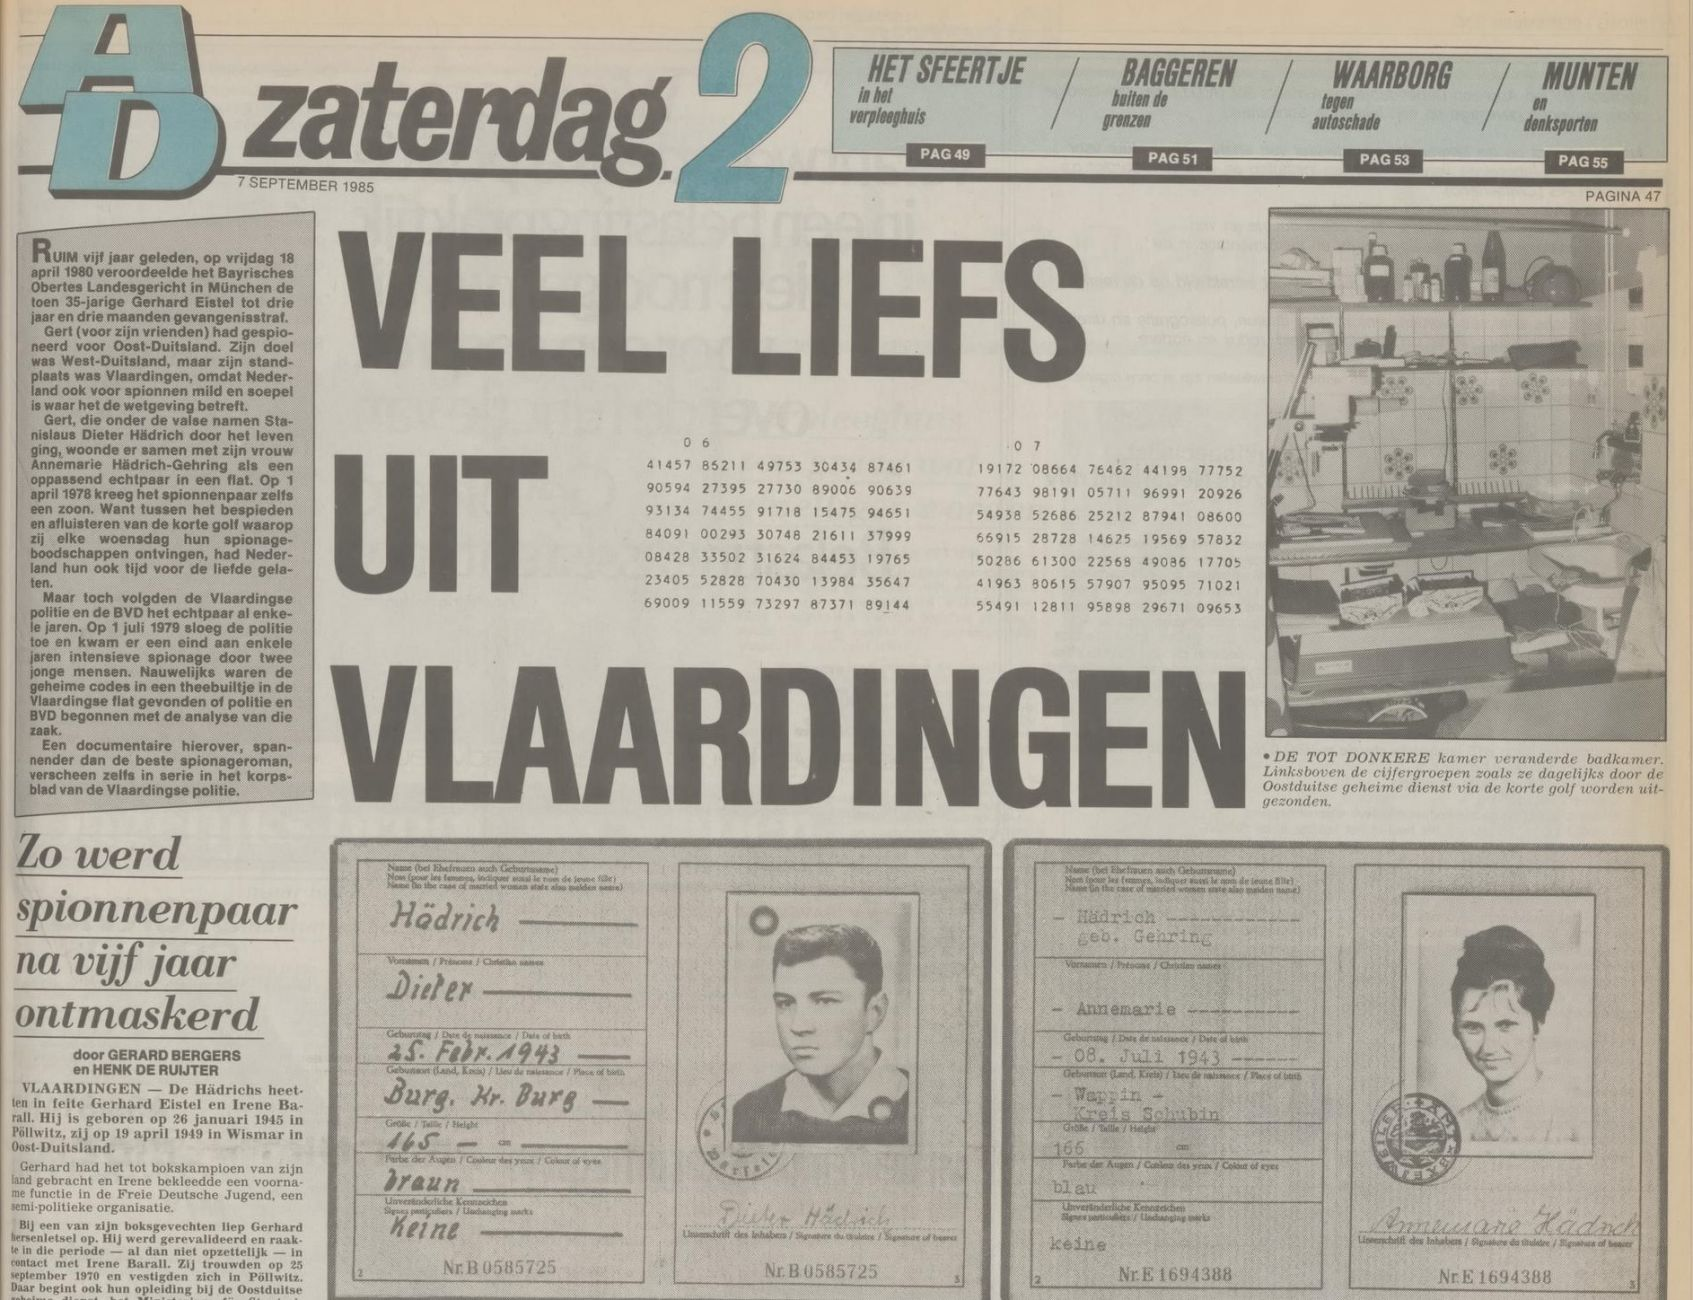 Oost-Duitse spionnen in Vlaardingen